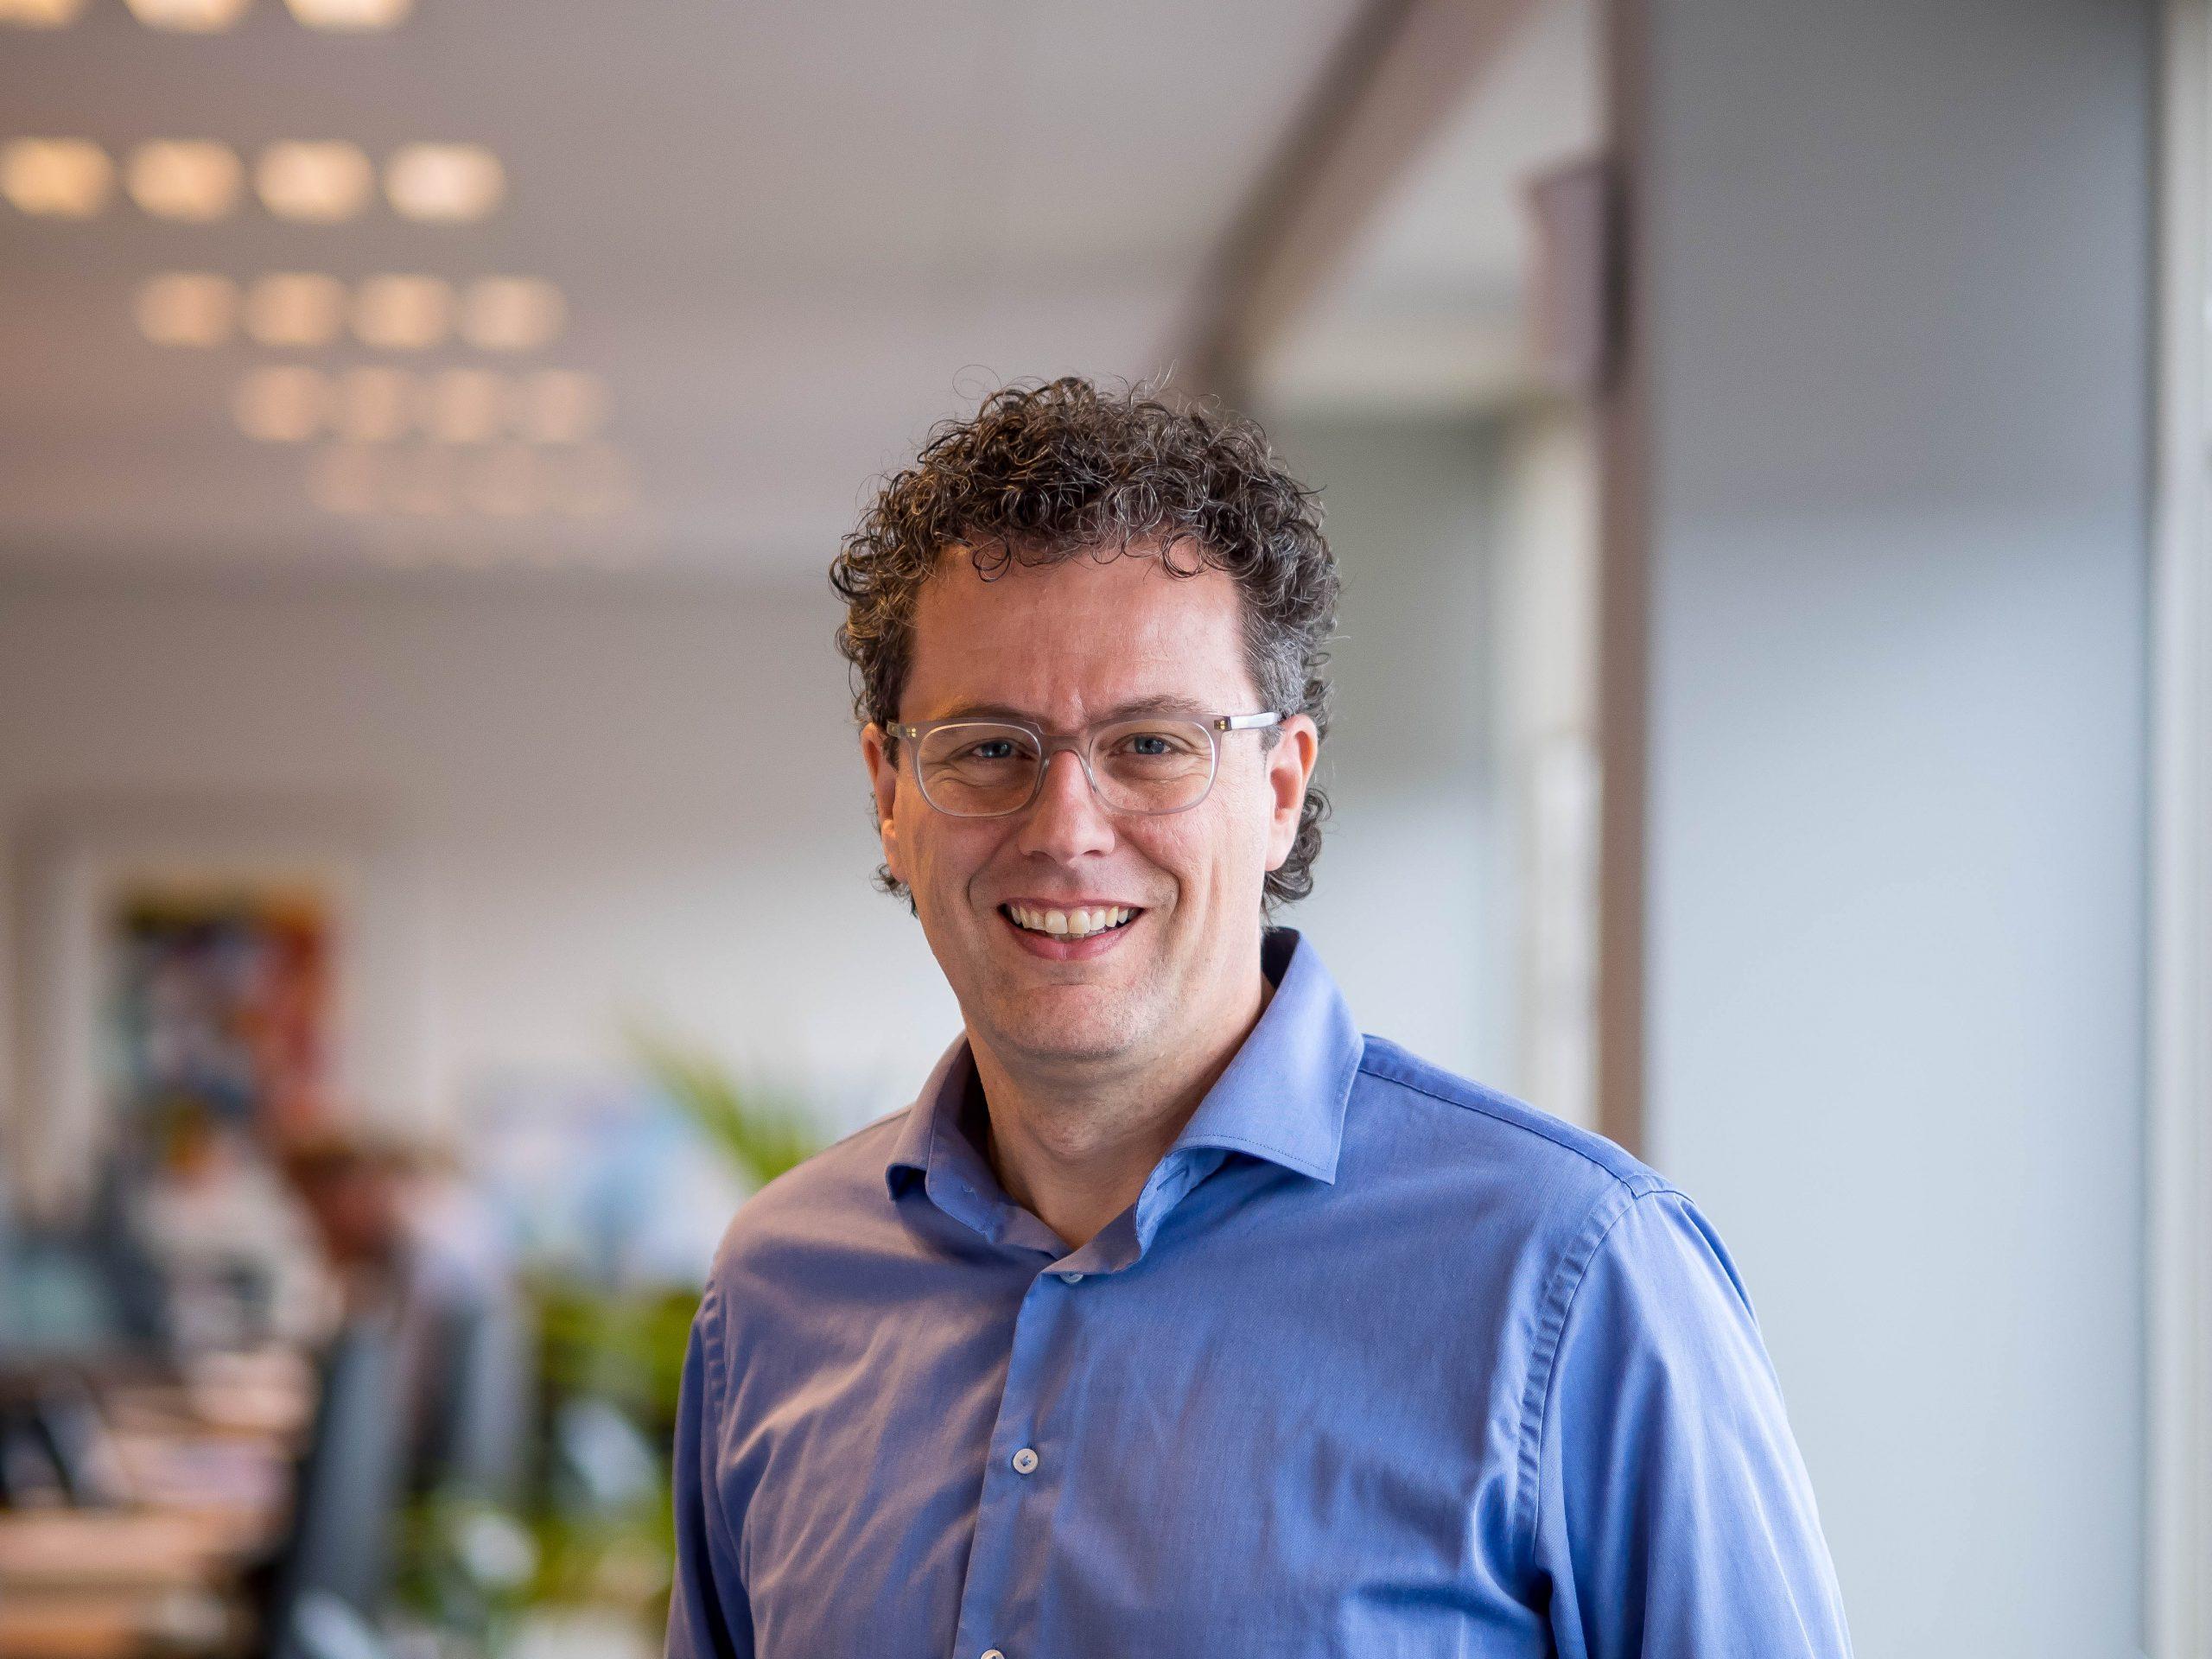 Edwin van der Sande